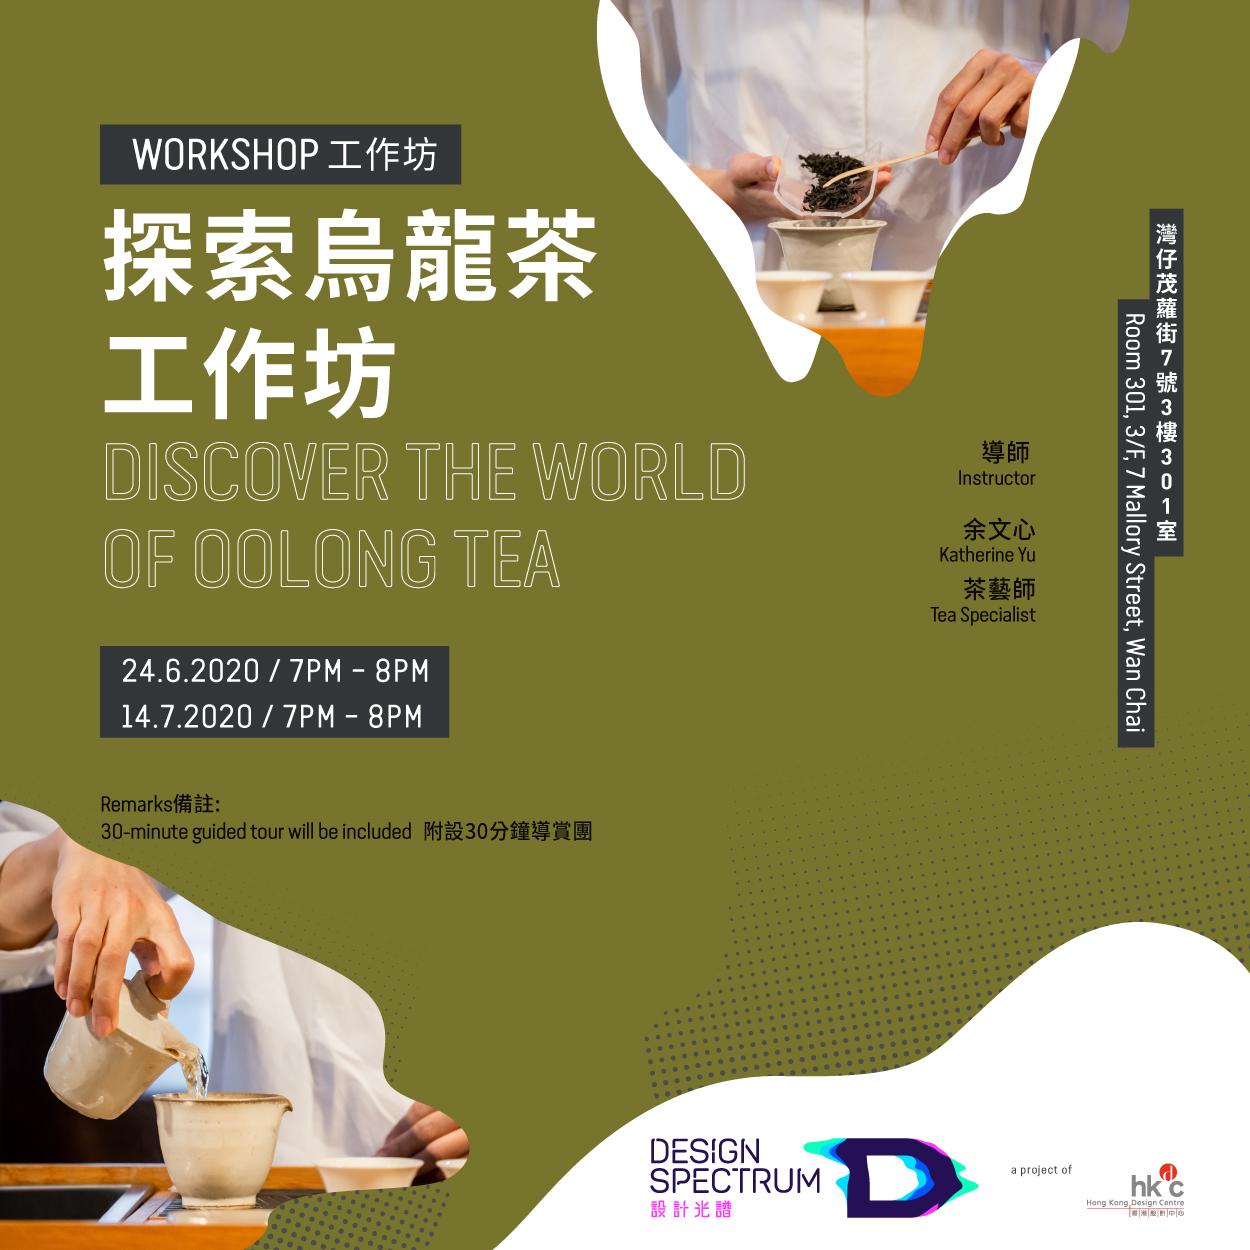 Design Spectrumdiscover-the-world-of-oolong-tea